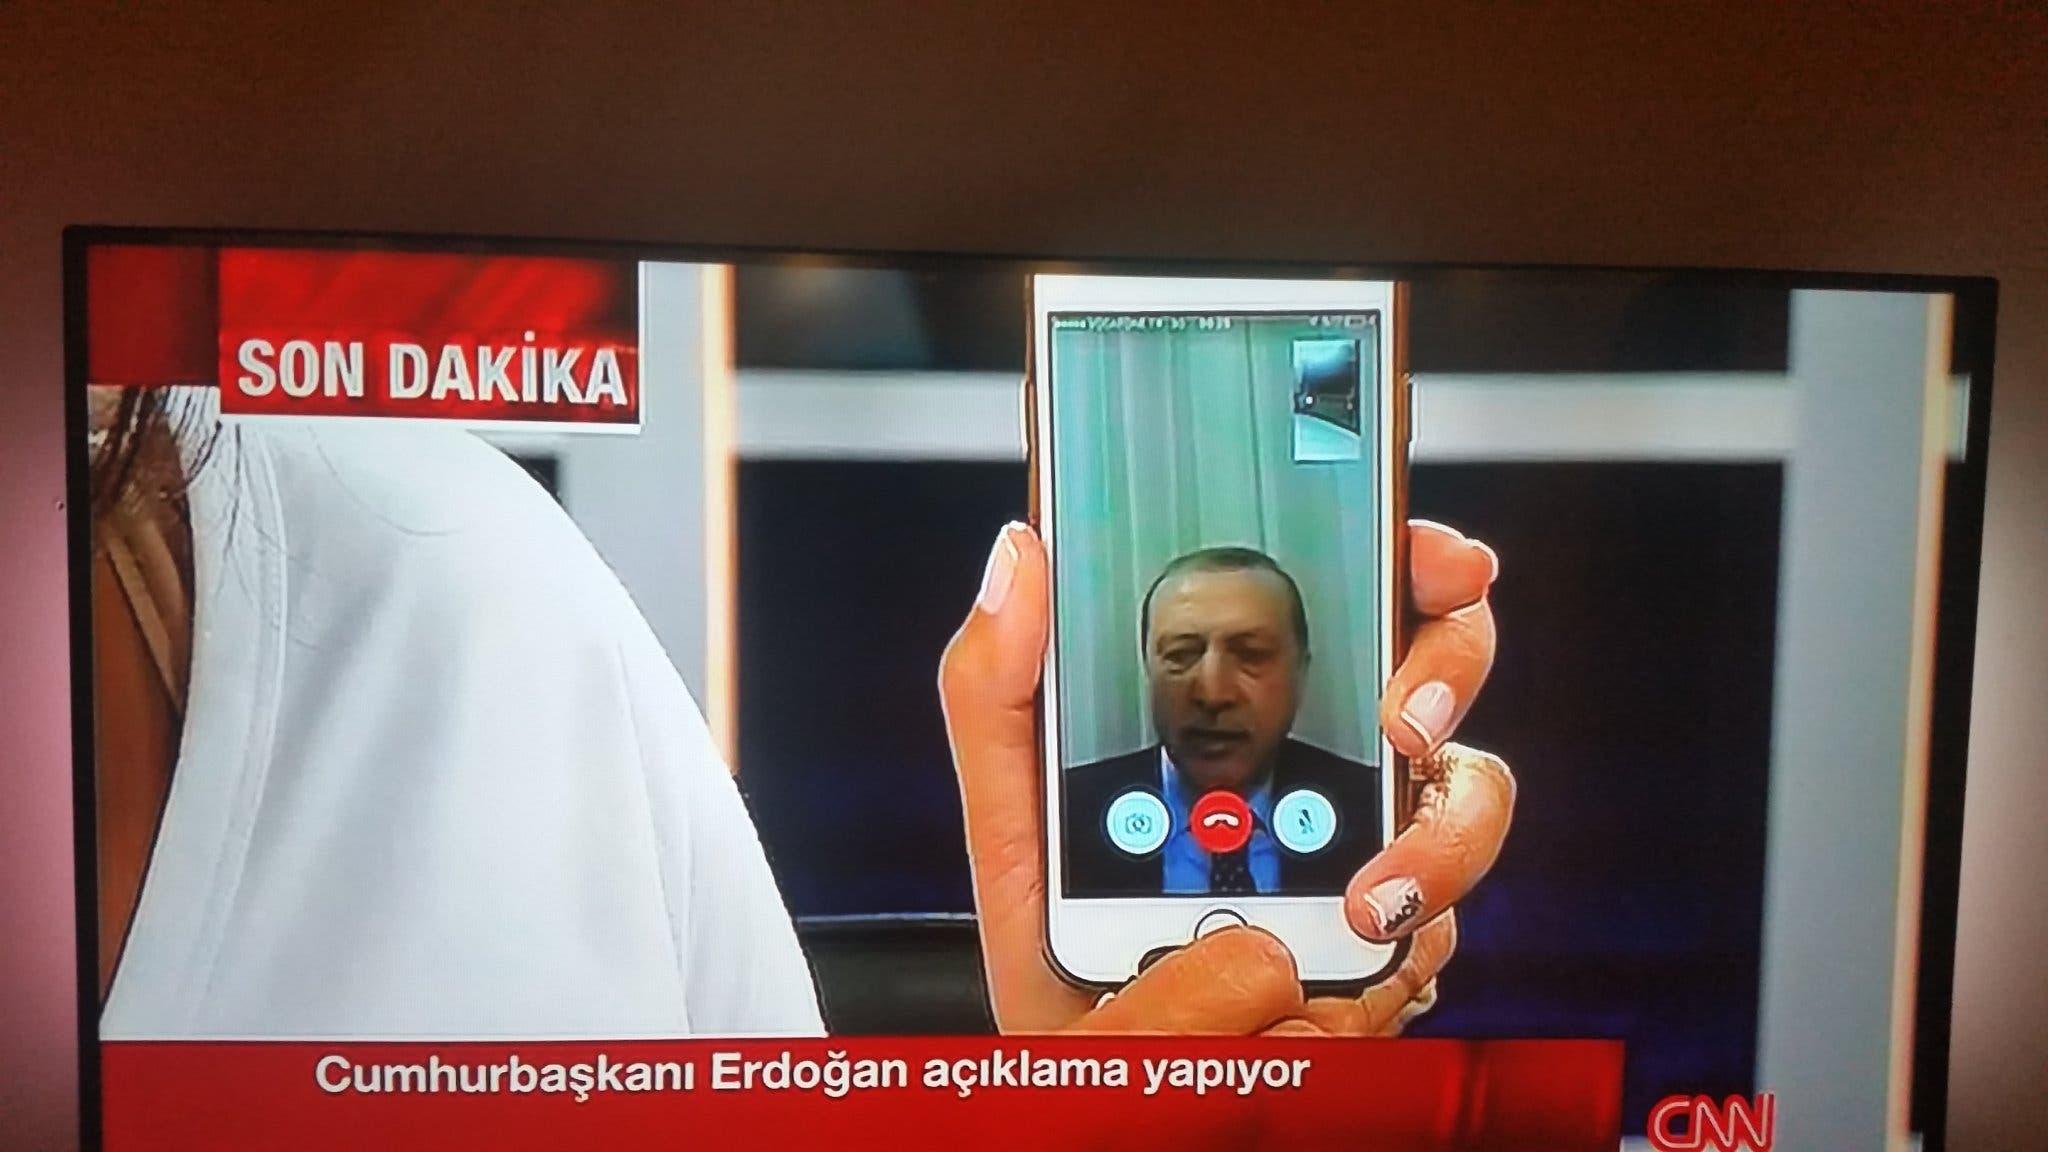 erdogan social media skype